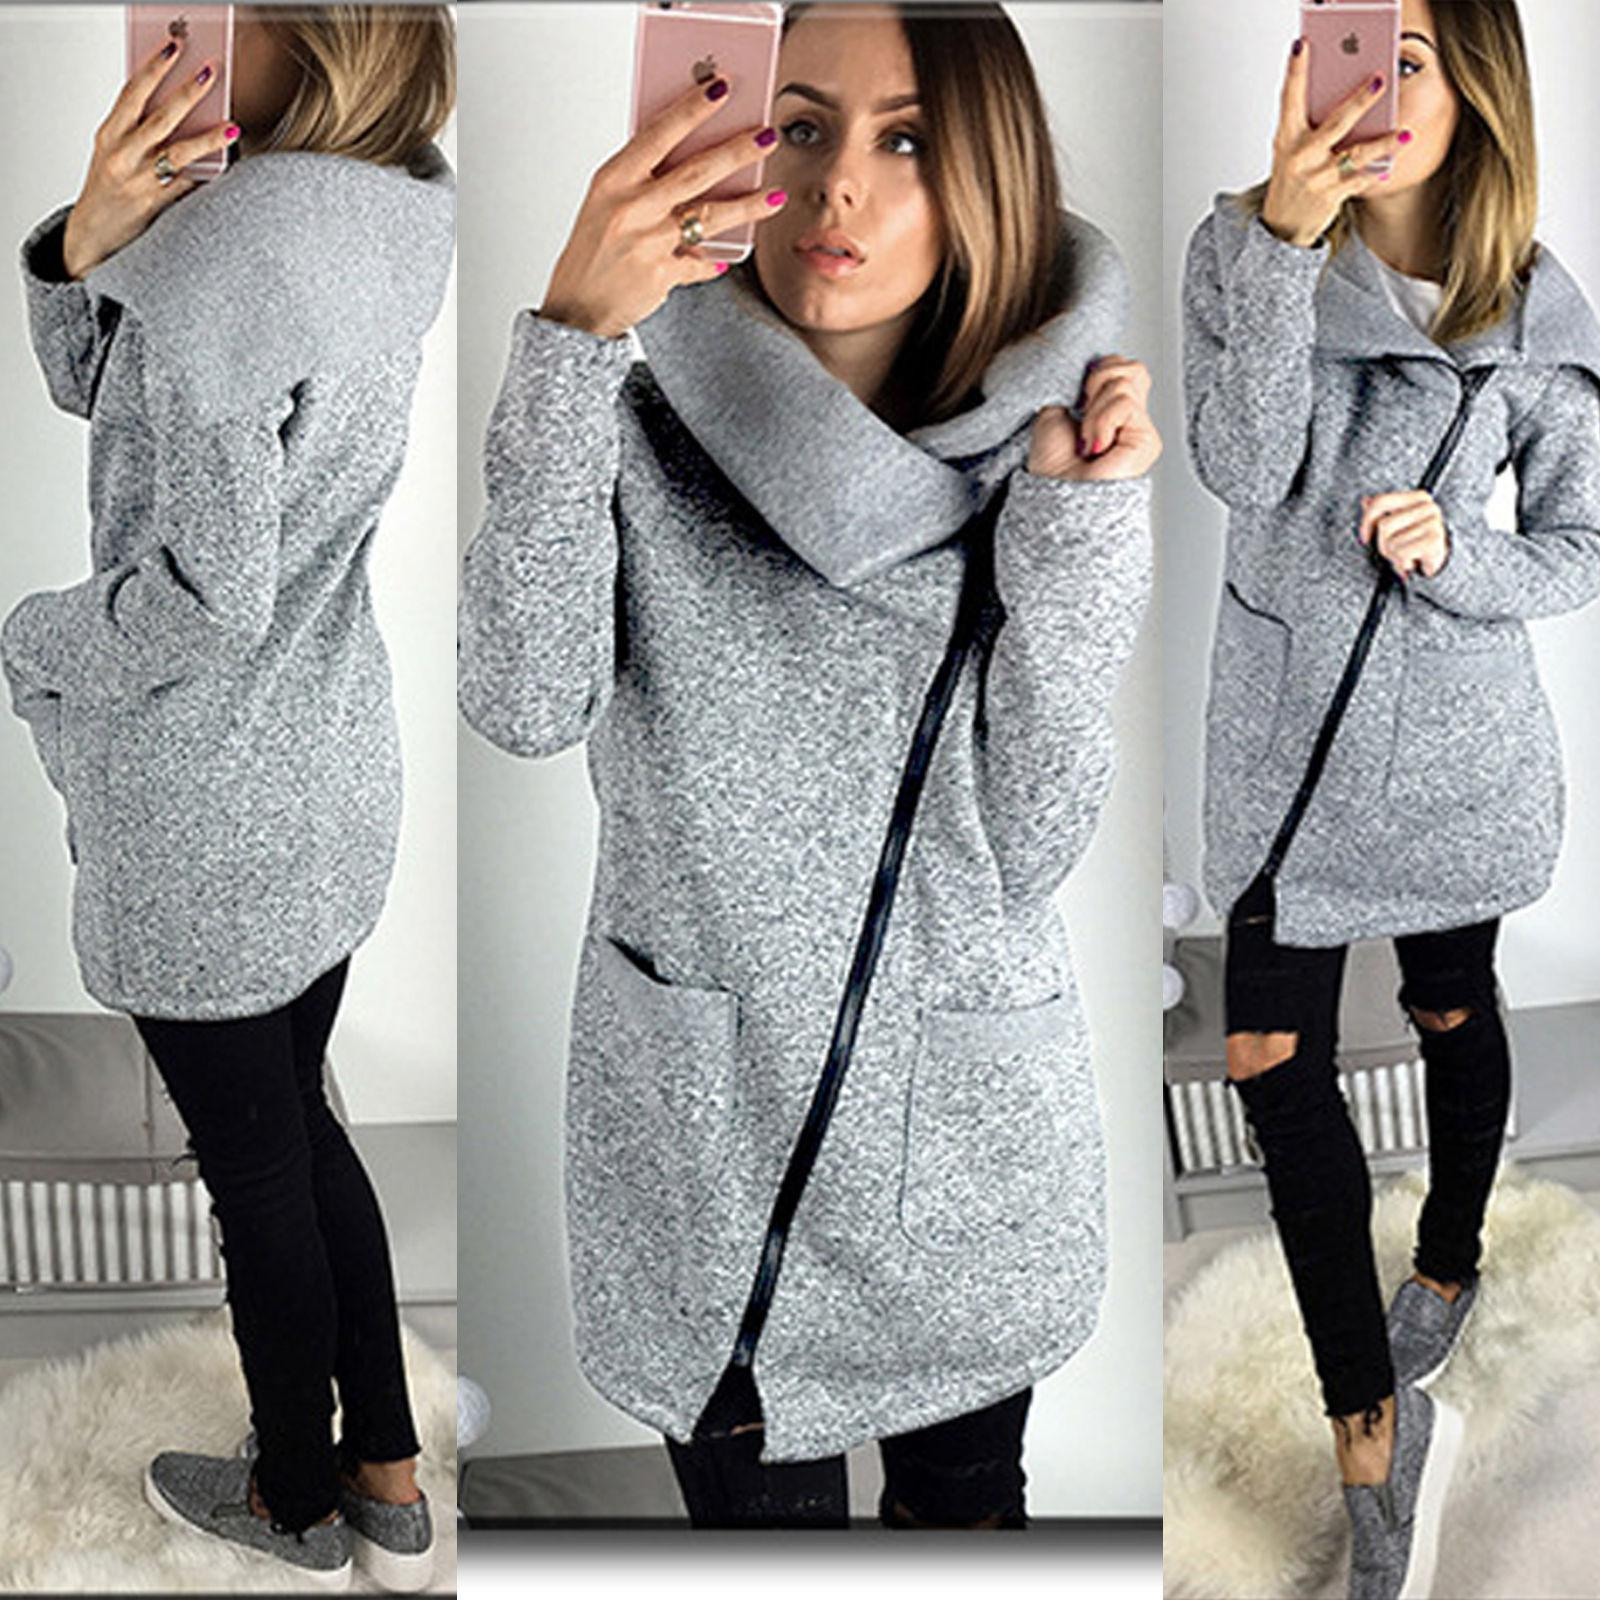 super popular 15813 d7d08 Womens Warm Lässige Hoodie Jacke Mantel Lange Reißverschluss Sweatshirt  Damen Dünne Dünne Herbst Oblique Zipper Outwear Trainingsanzug Tops